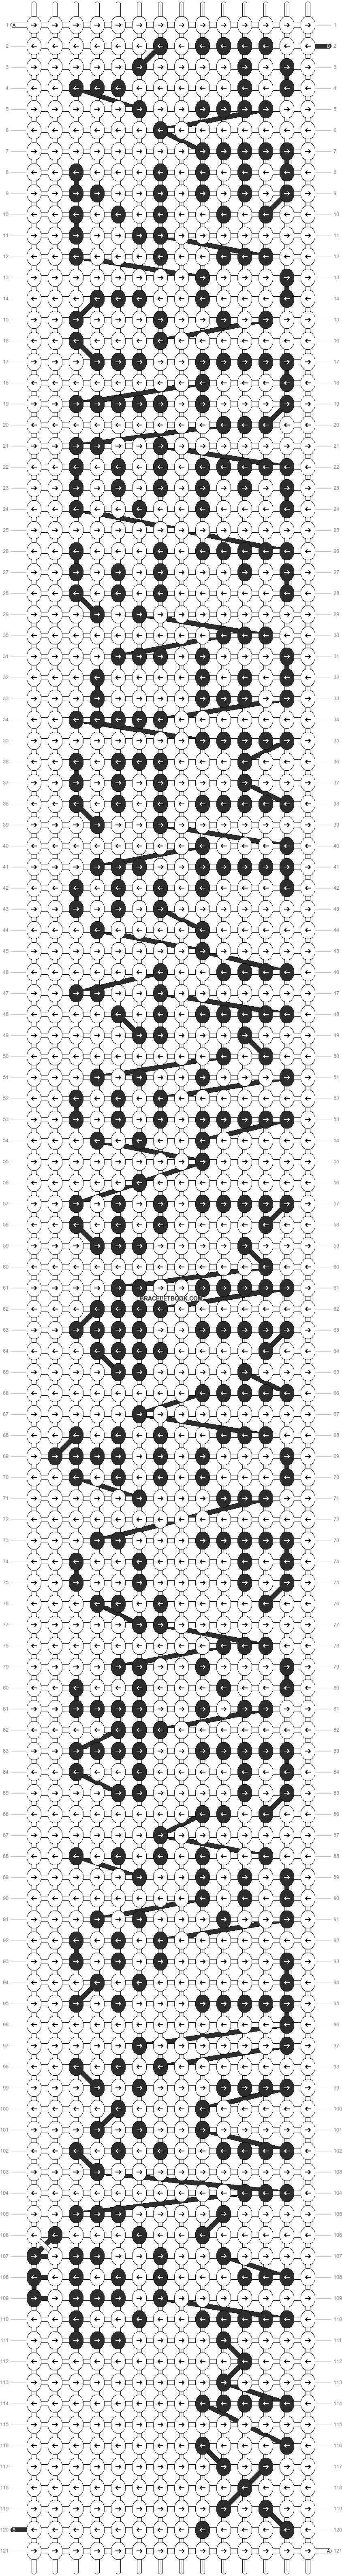 Alpha pattern #1785 pattern